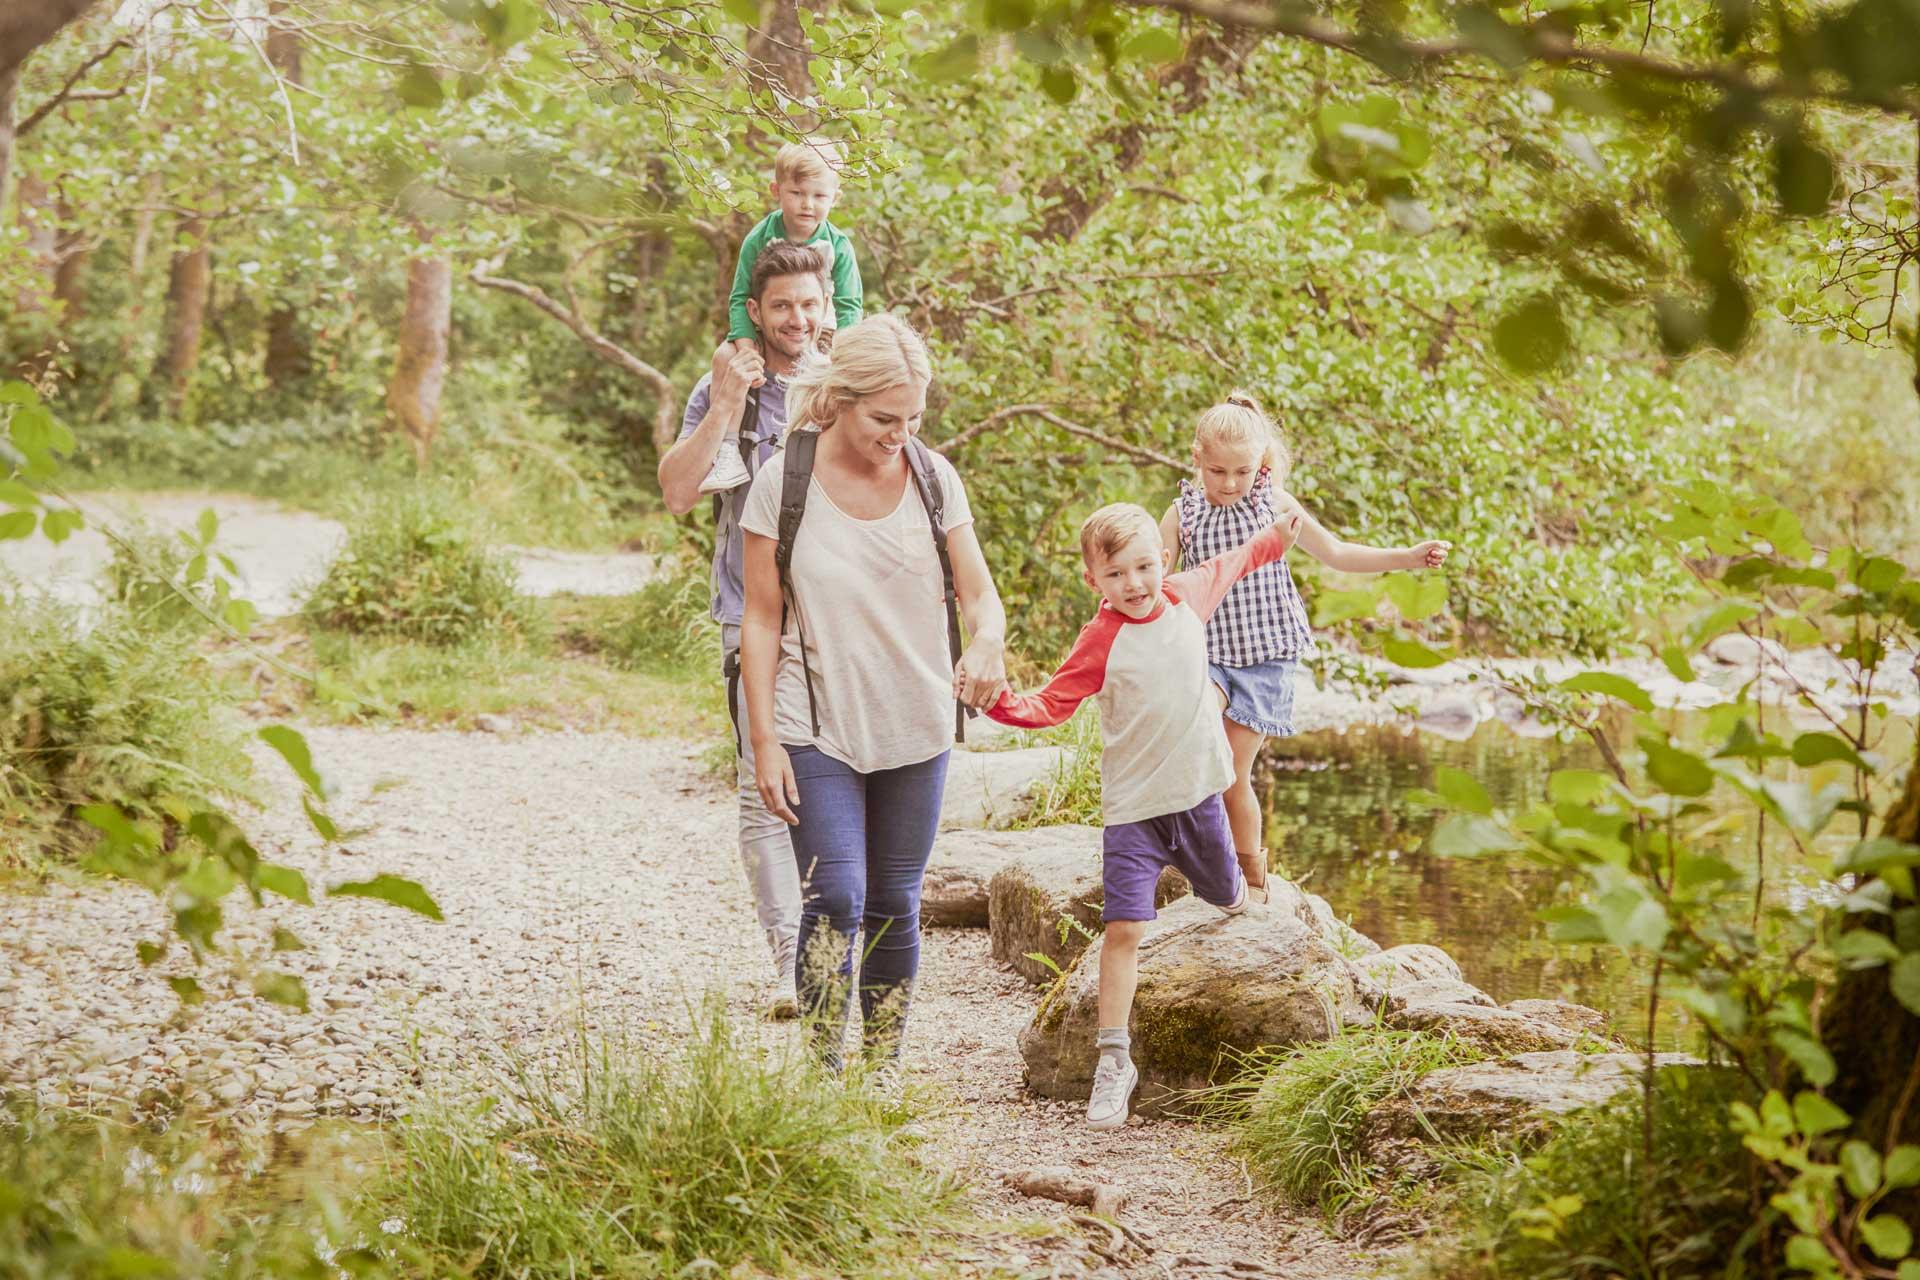 Hiking at Kohlnhofer Insurance Agency